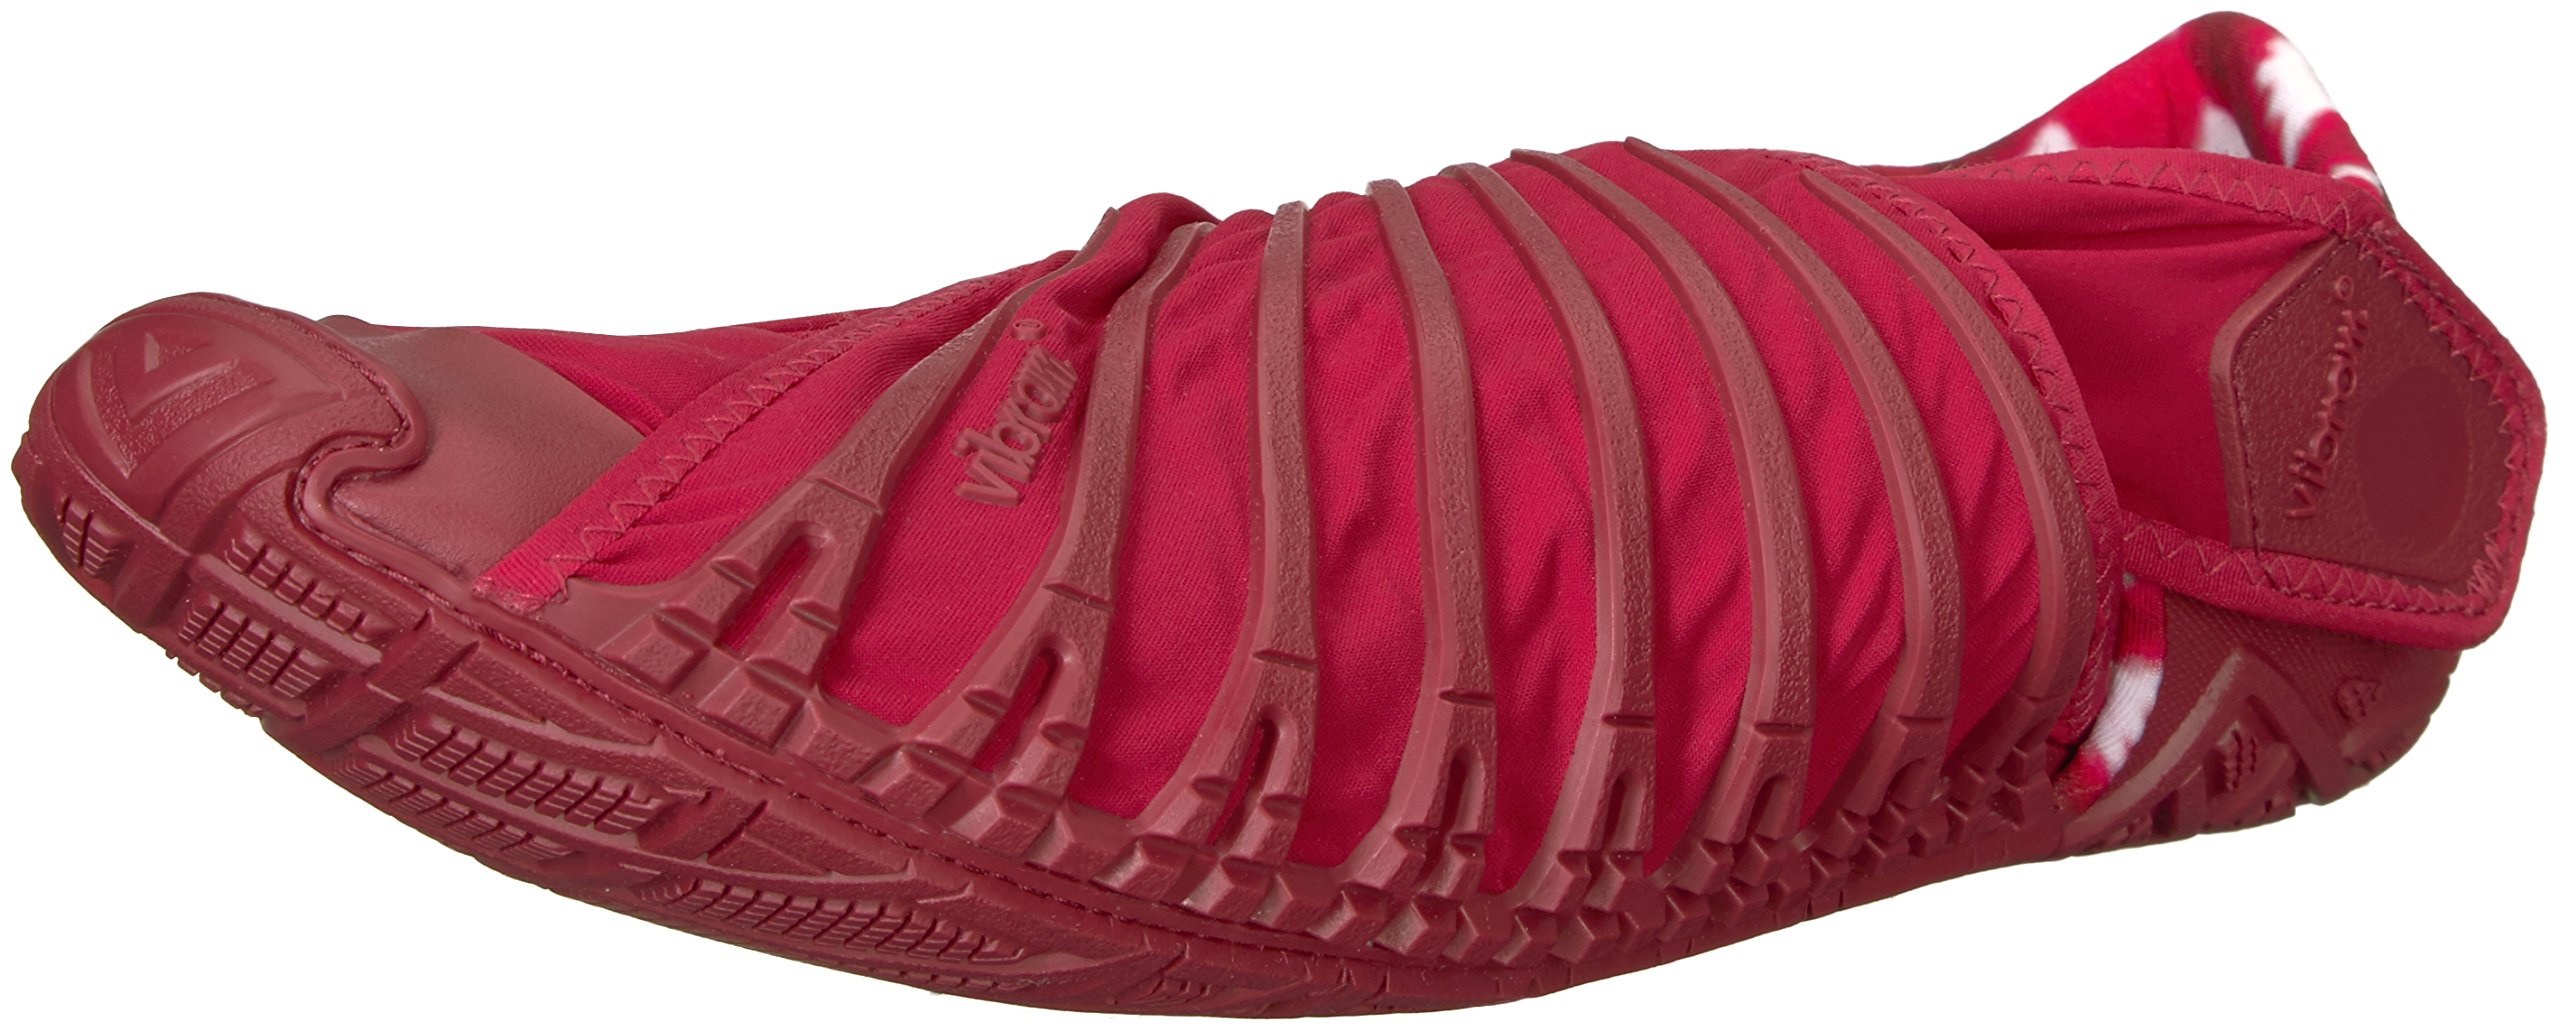 Vibram Women's Furoshiki Beet Red Sneaker 9-9.5 M B EU (42 EU/9-9.5 US US)